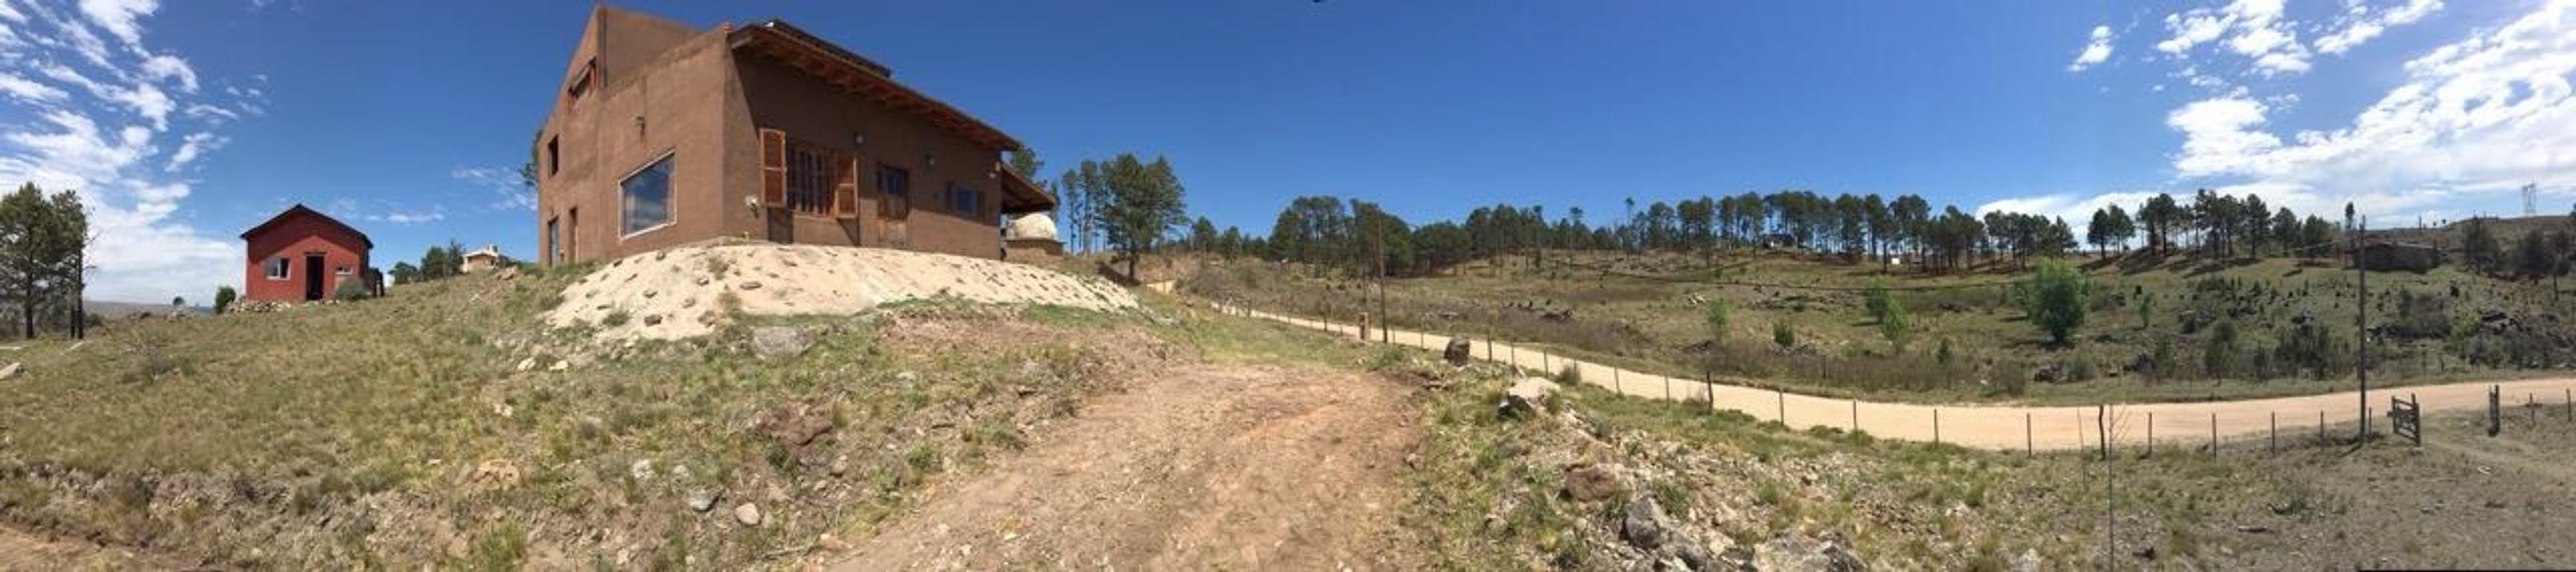 RE-TASADO - Dueño Directo Vende Casa En Villa Yacanto. Escuchamos Ofertas Razonables